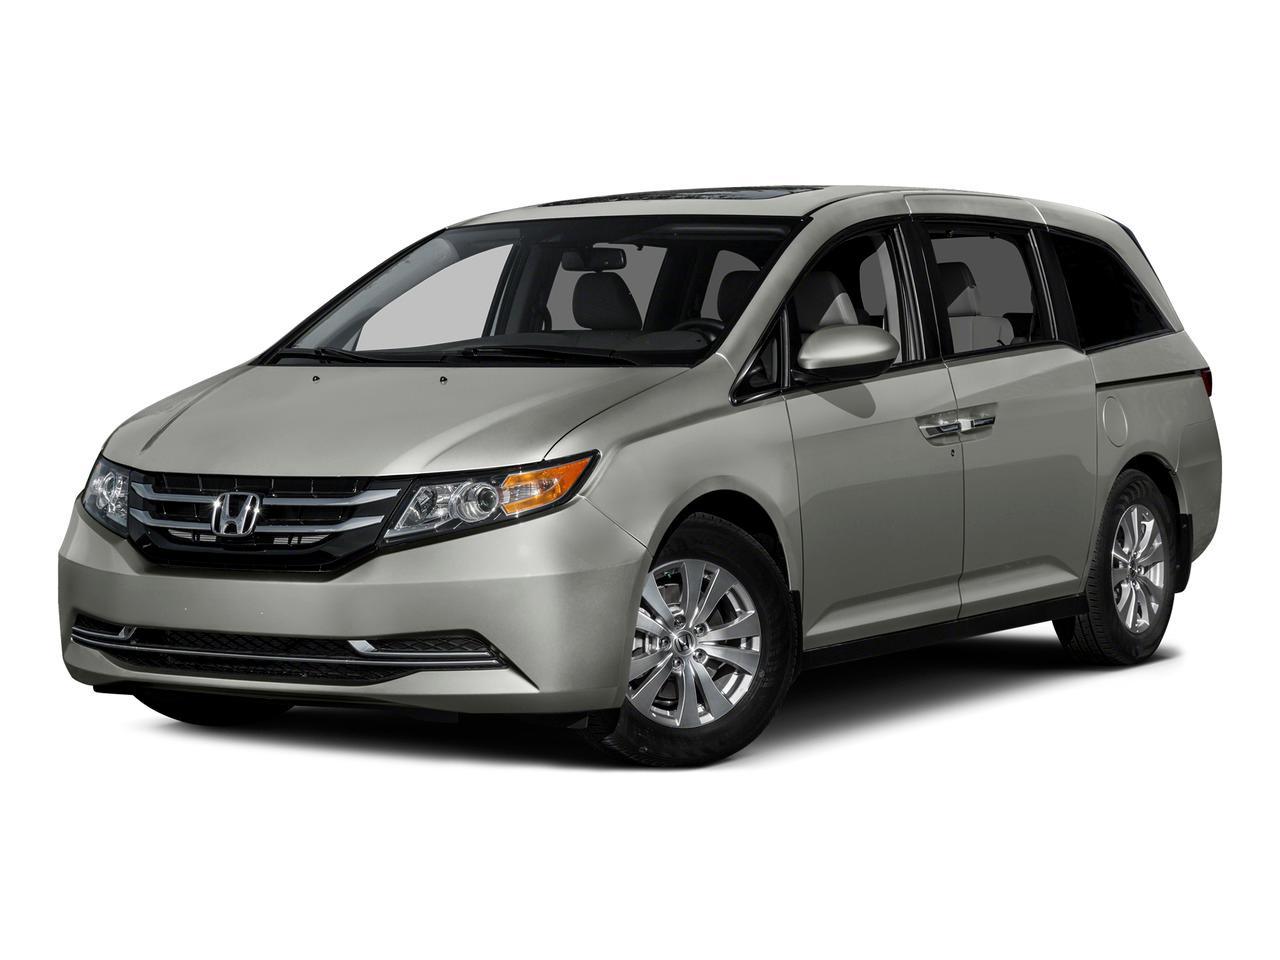 2015 Honda Odyssey Vehicle Photo in GREENSBORO, NC 27405-6904